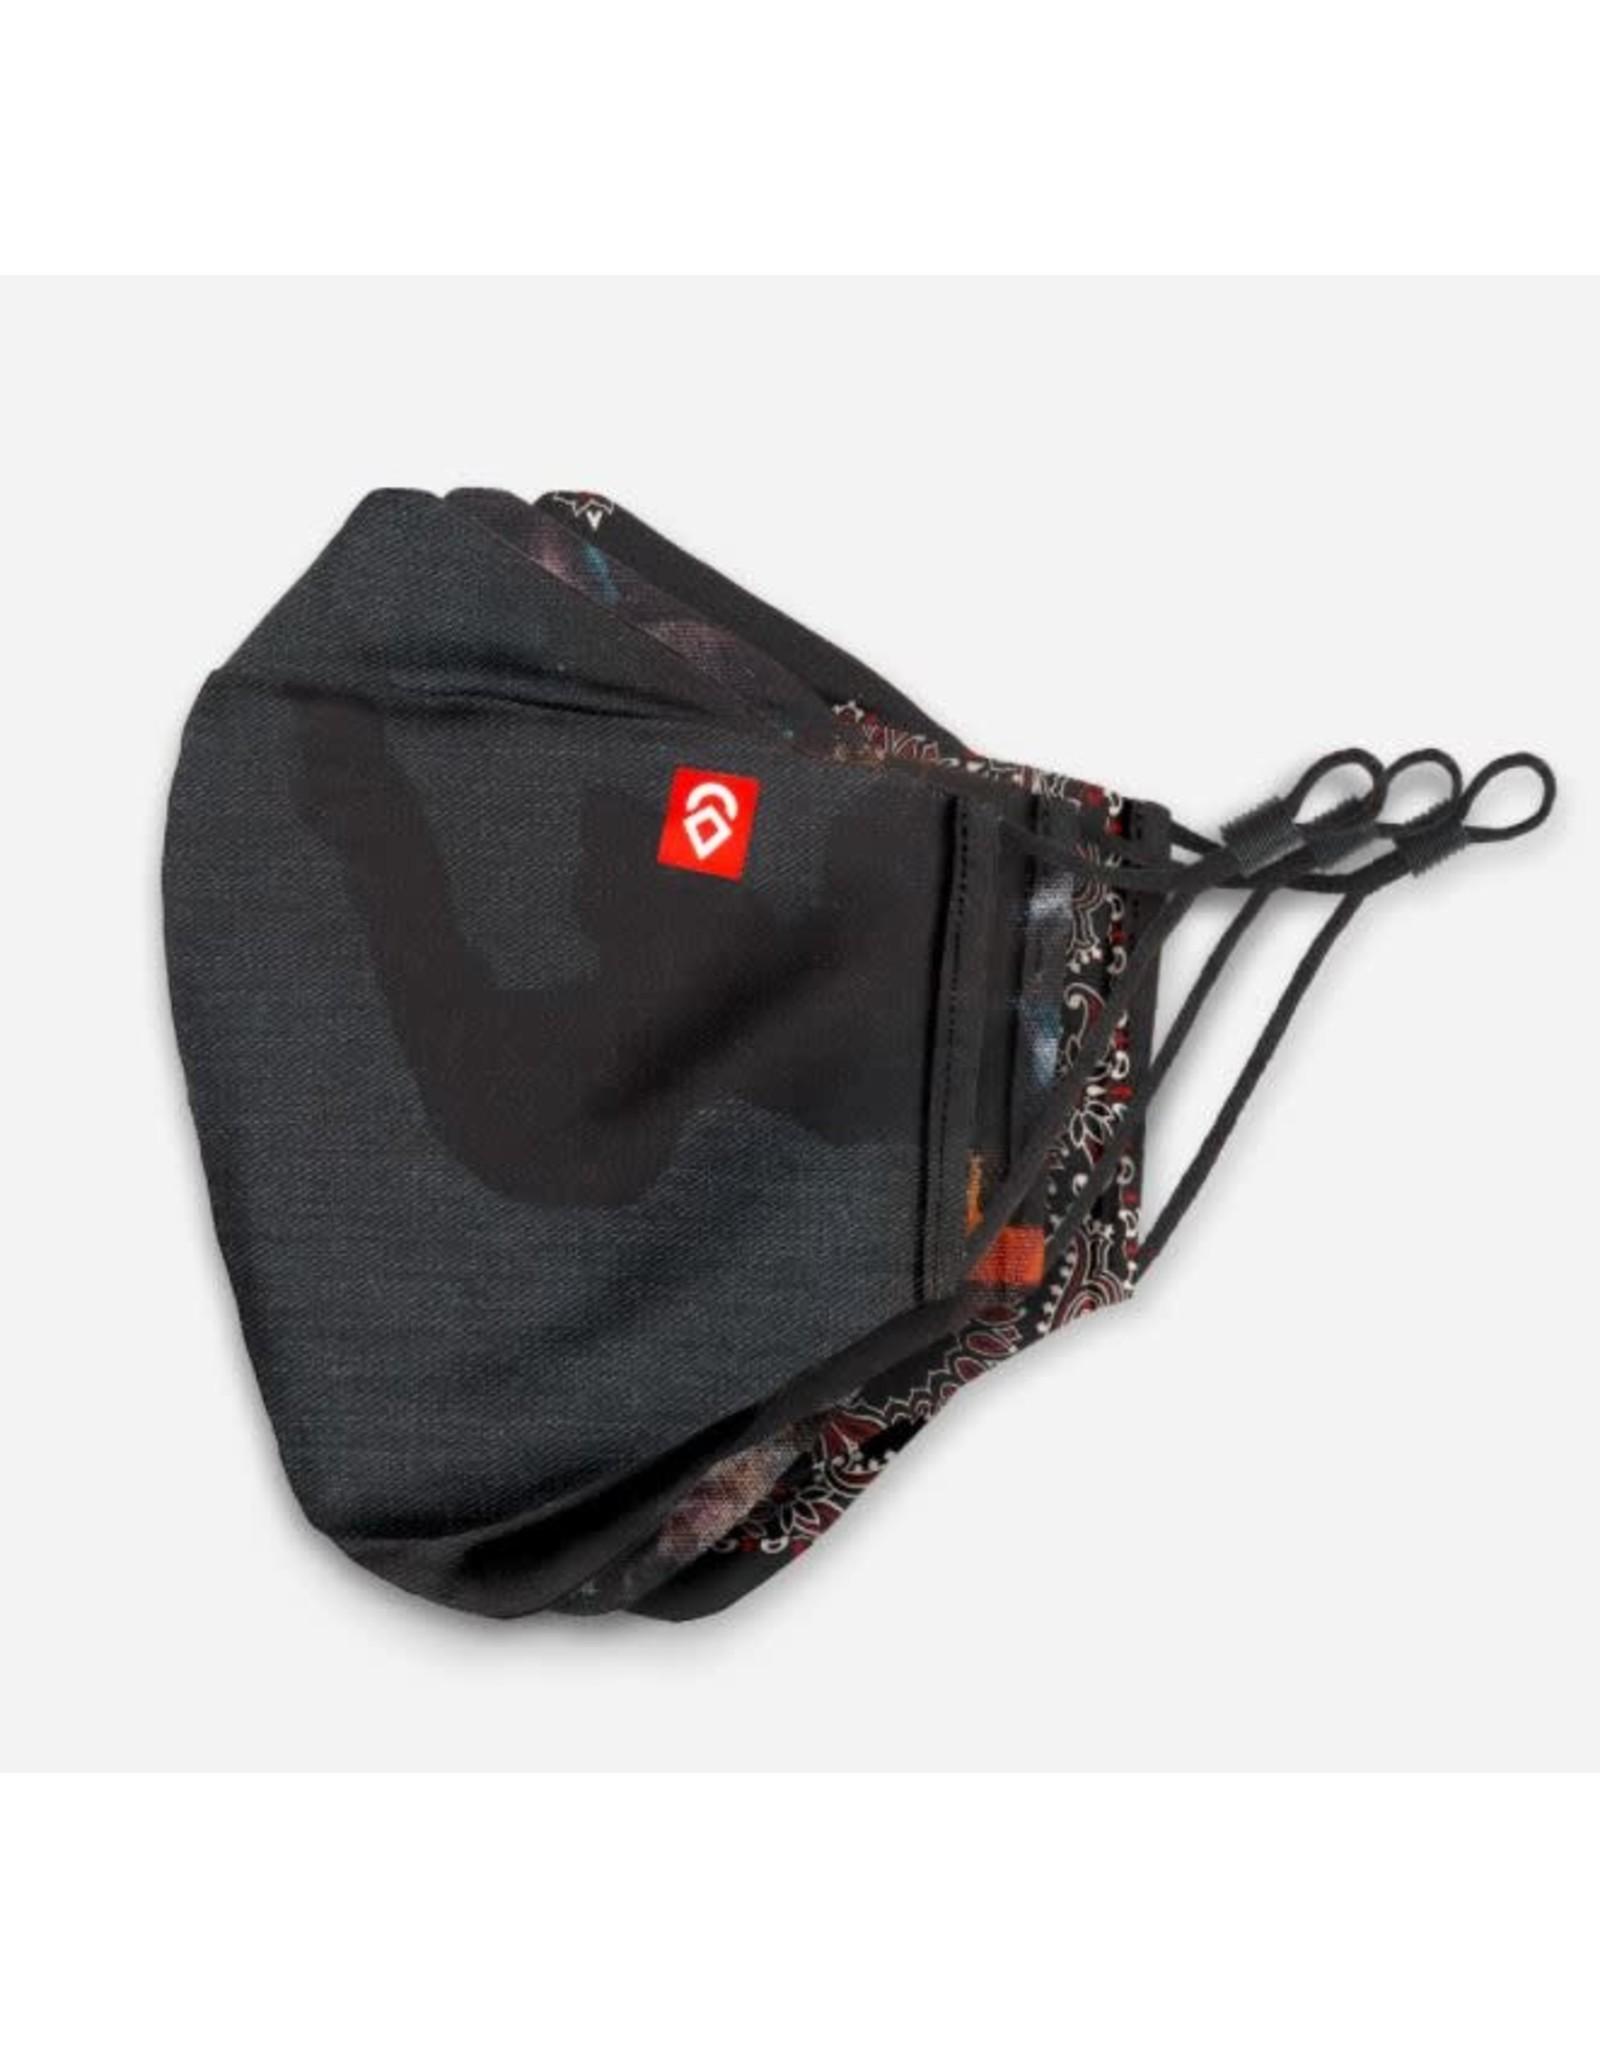 airhole Airhole - Masques advanced shibuya 3 pack stealth camo/studio/black paisley